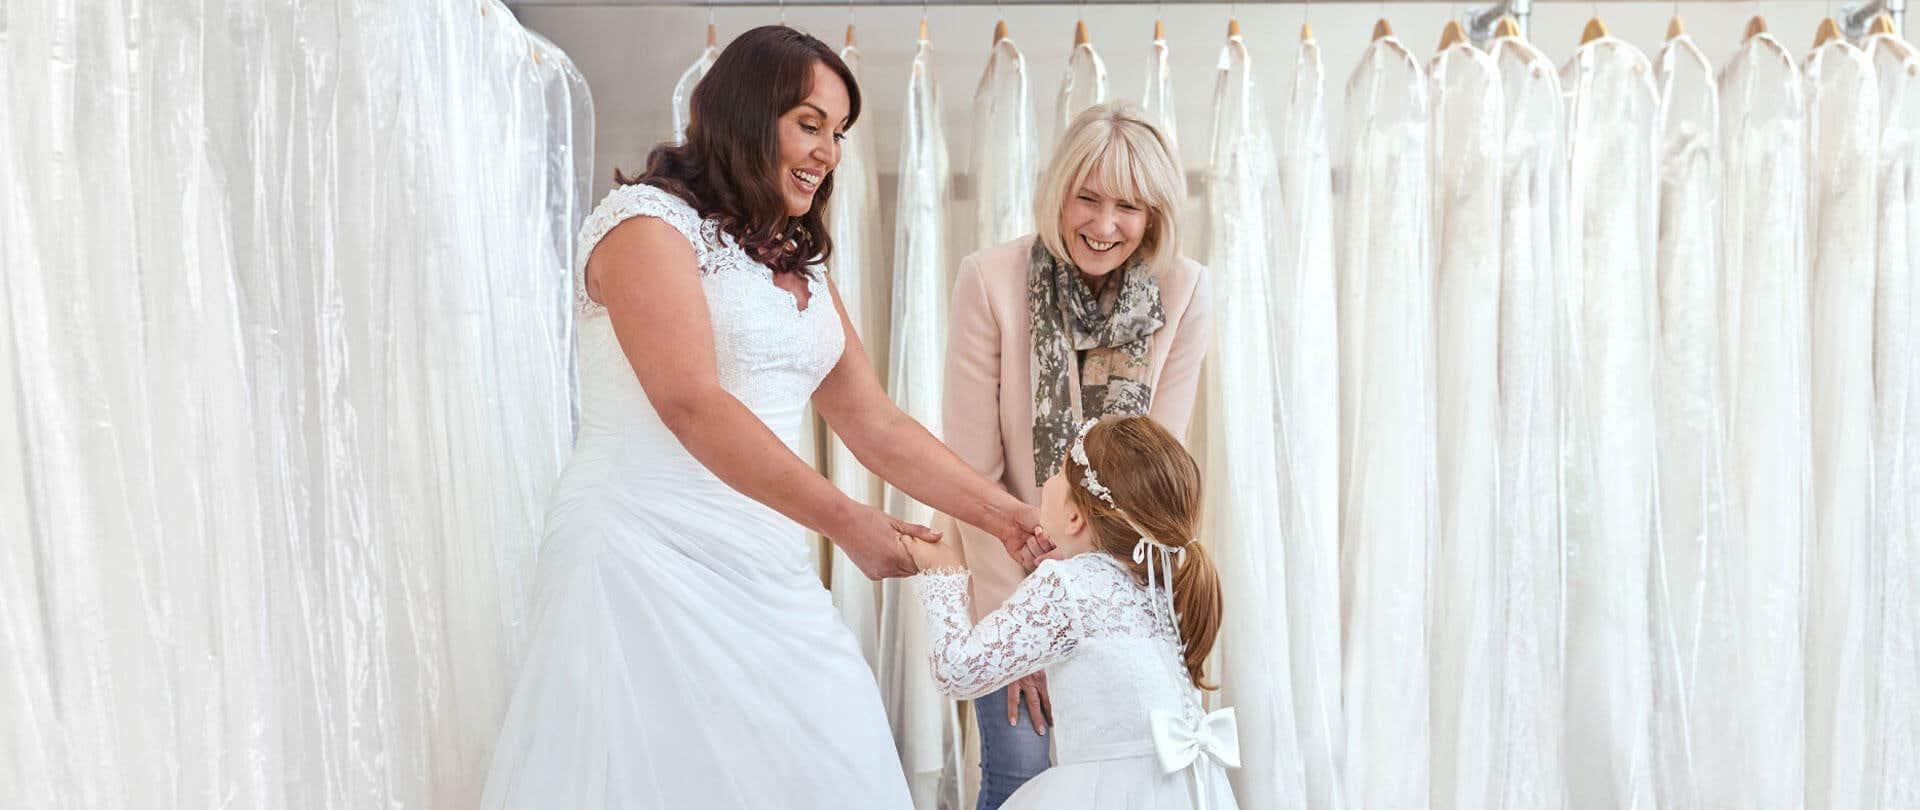 wed2b bridal consultation